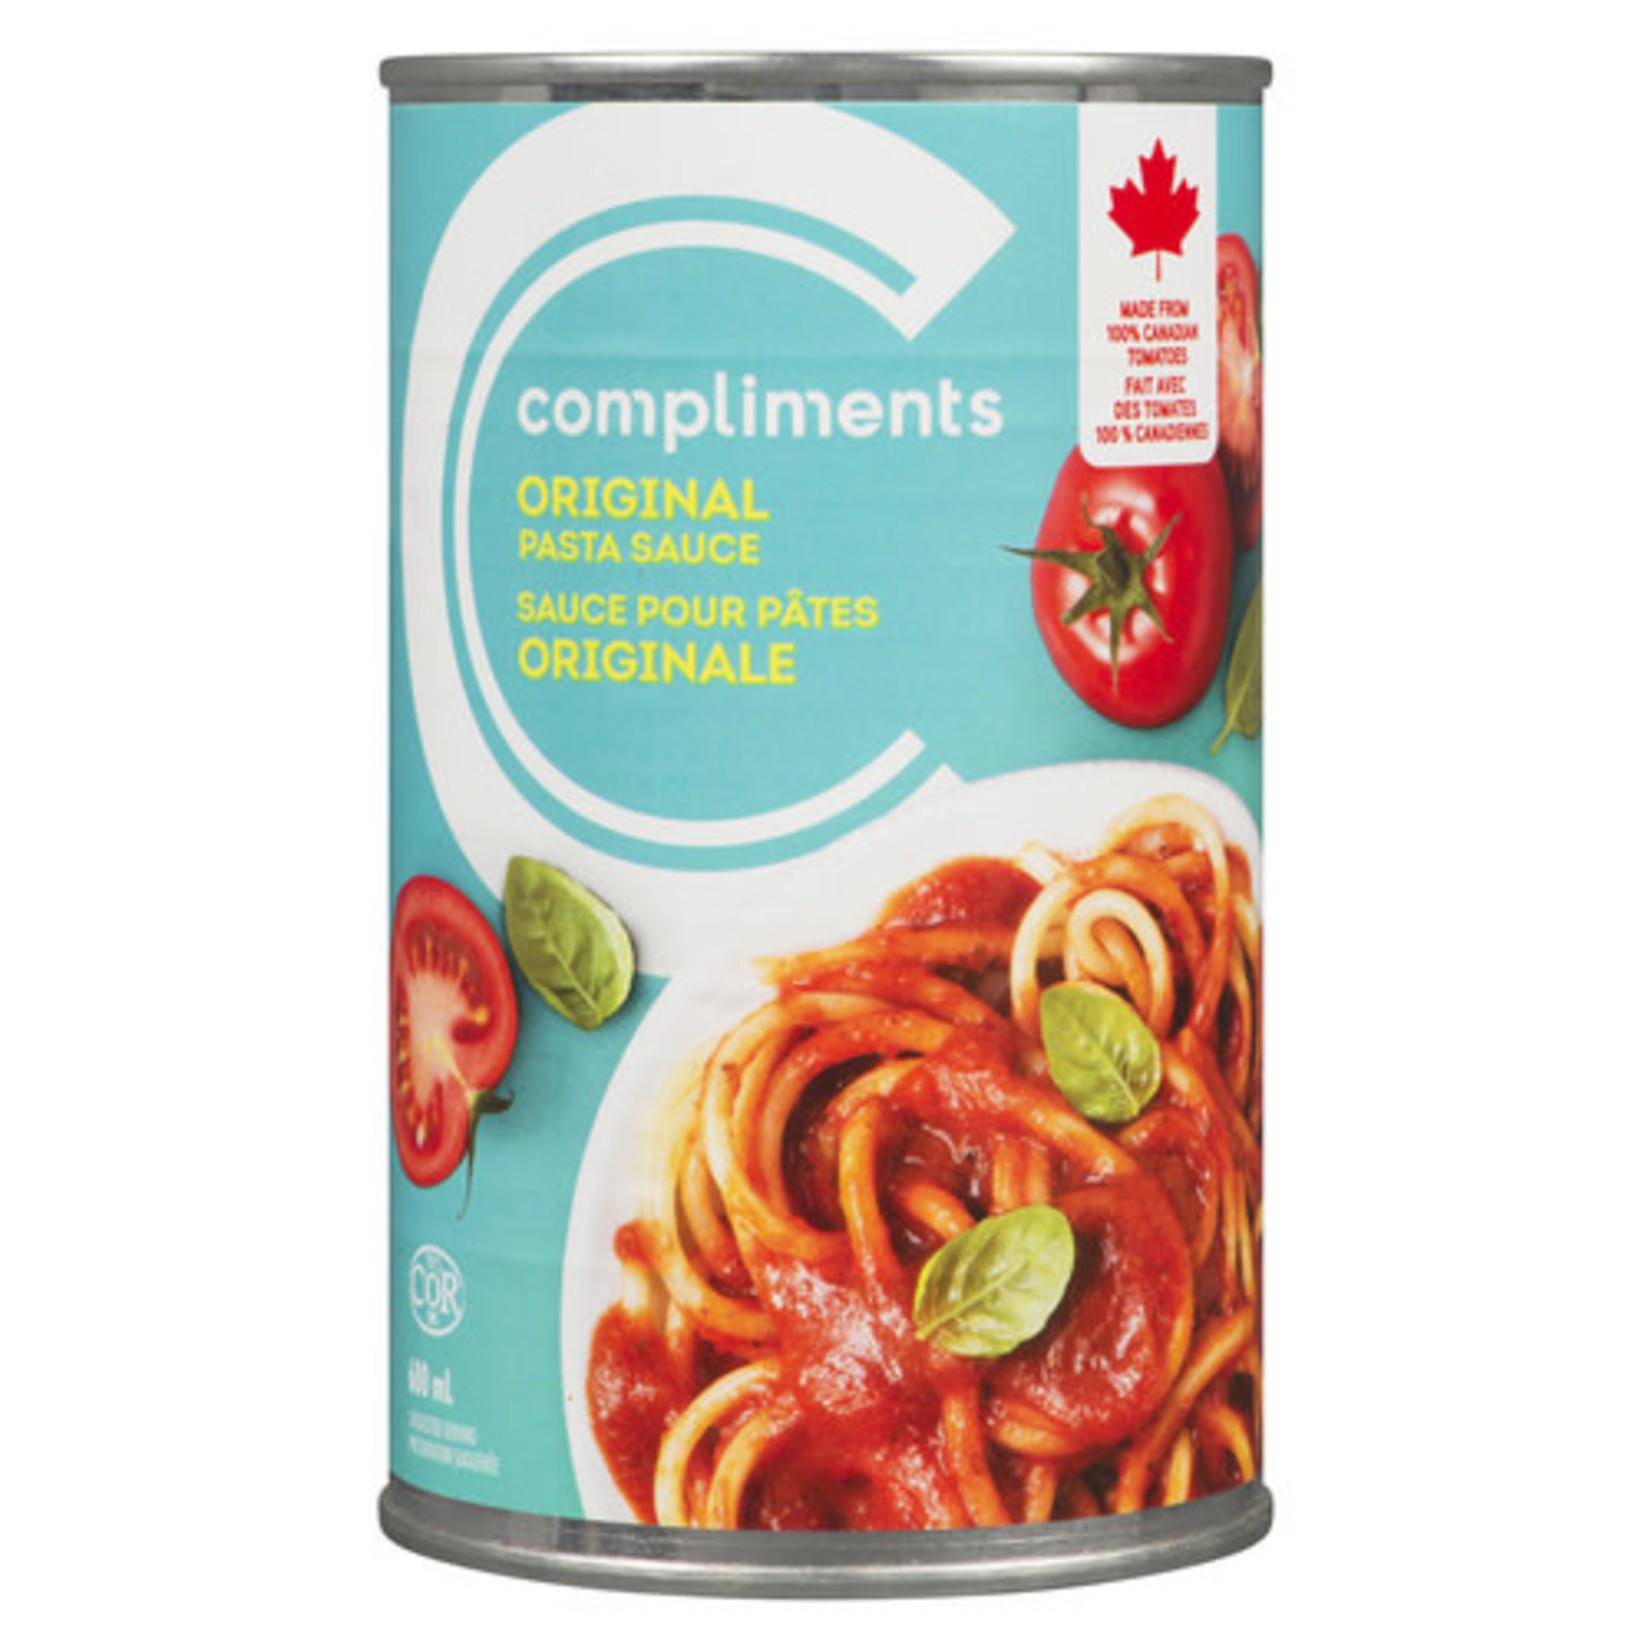 Compliments Original Pasta Sauce 680ml